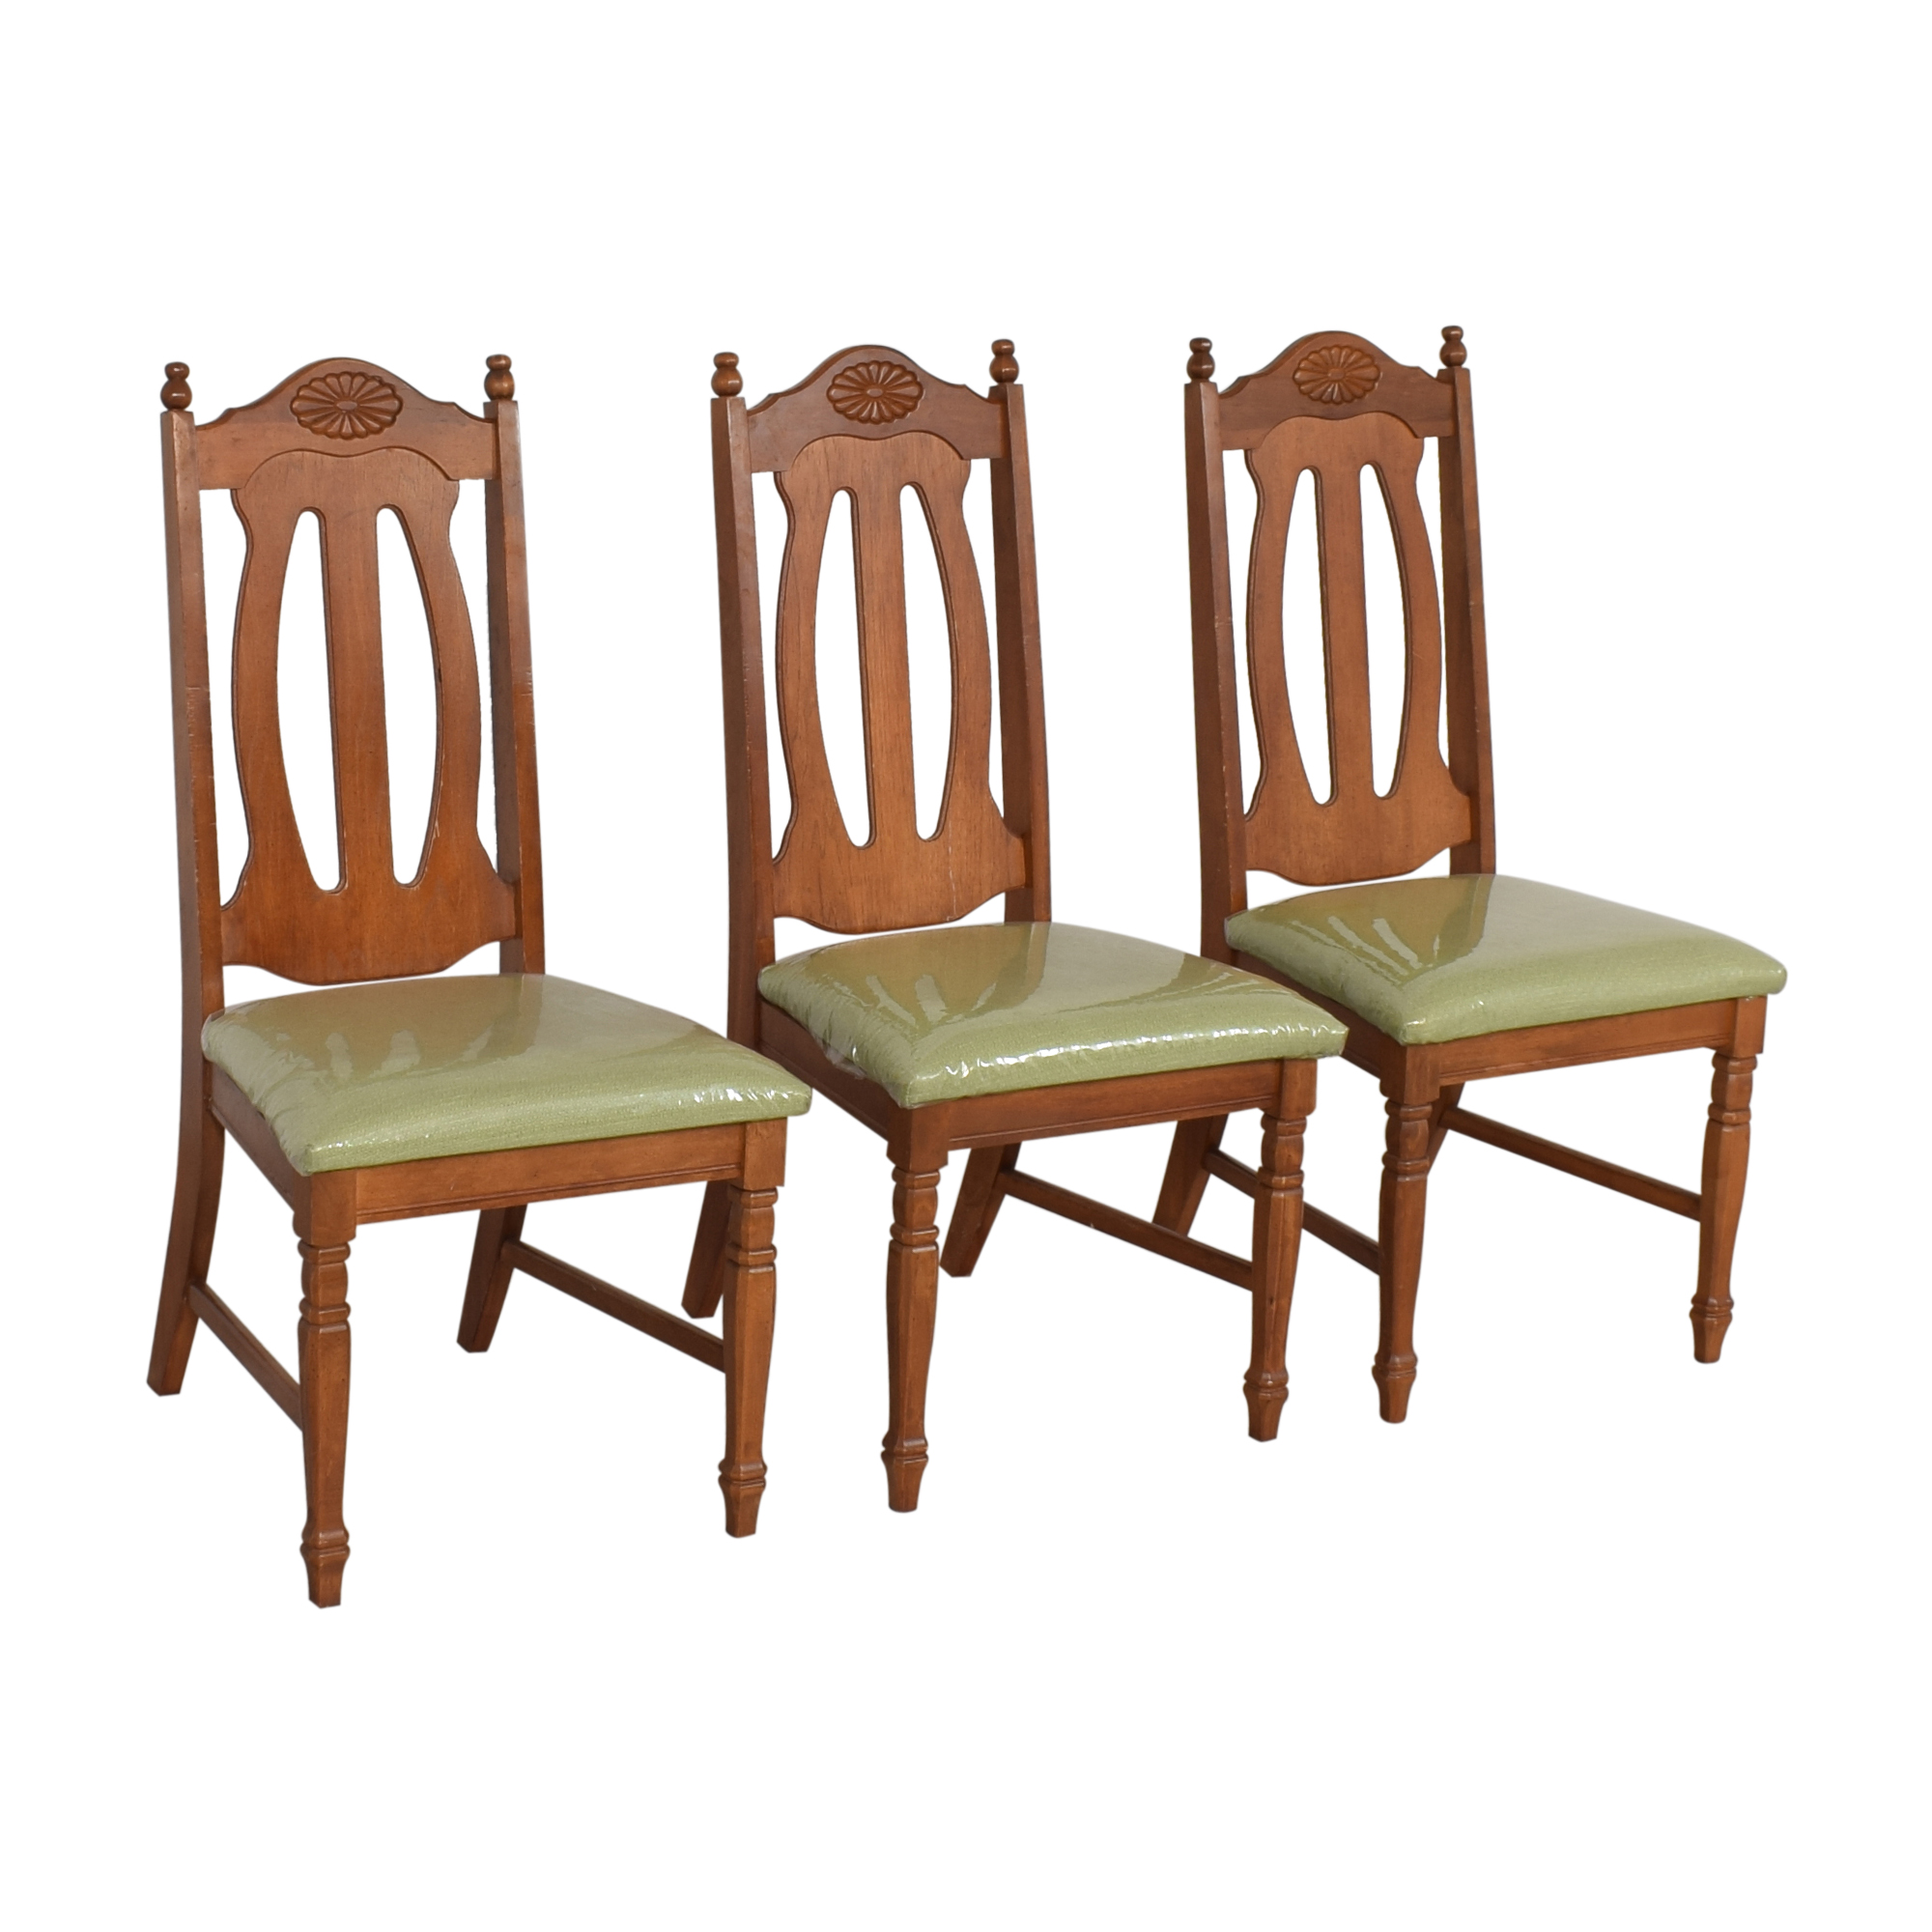 Bassett Furniture Bassett Furniture Vintage Dining Chairs nyc